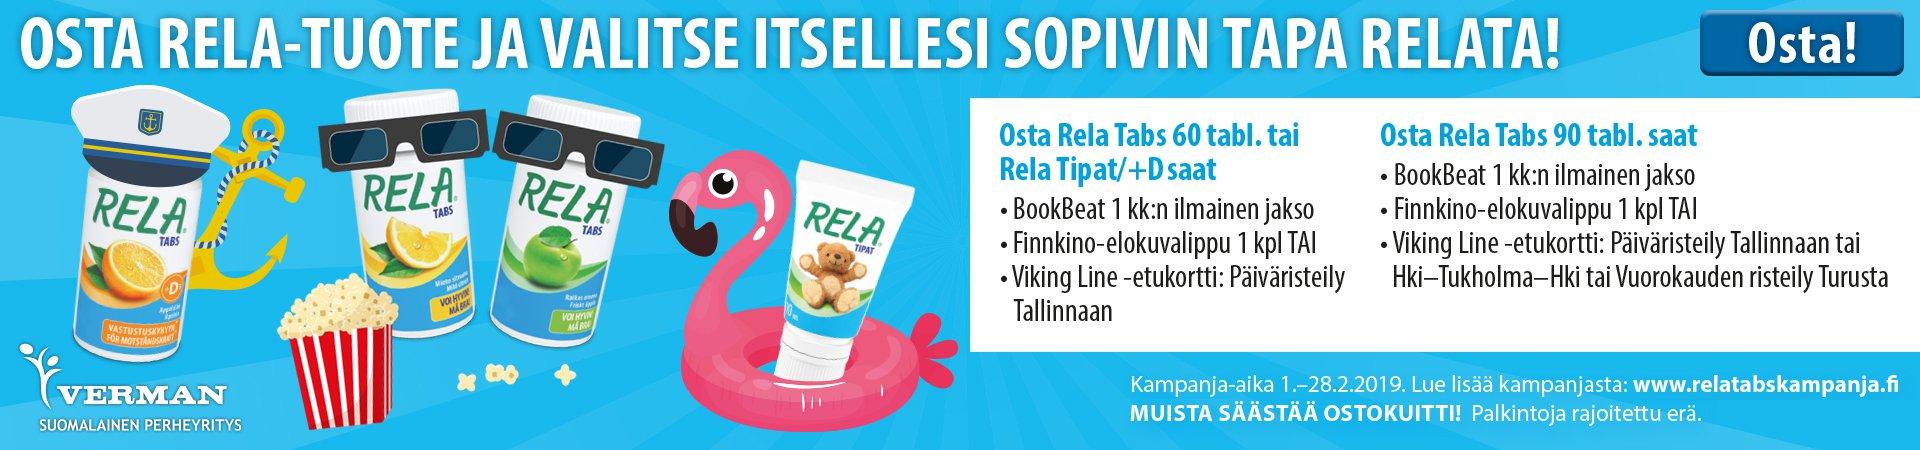 Osta Rela saat Viking Line, Bookbet tai Finnkino lahjakortin